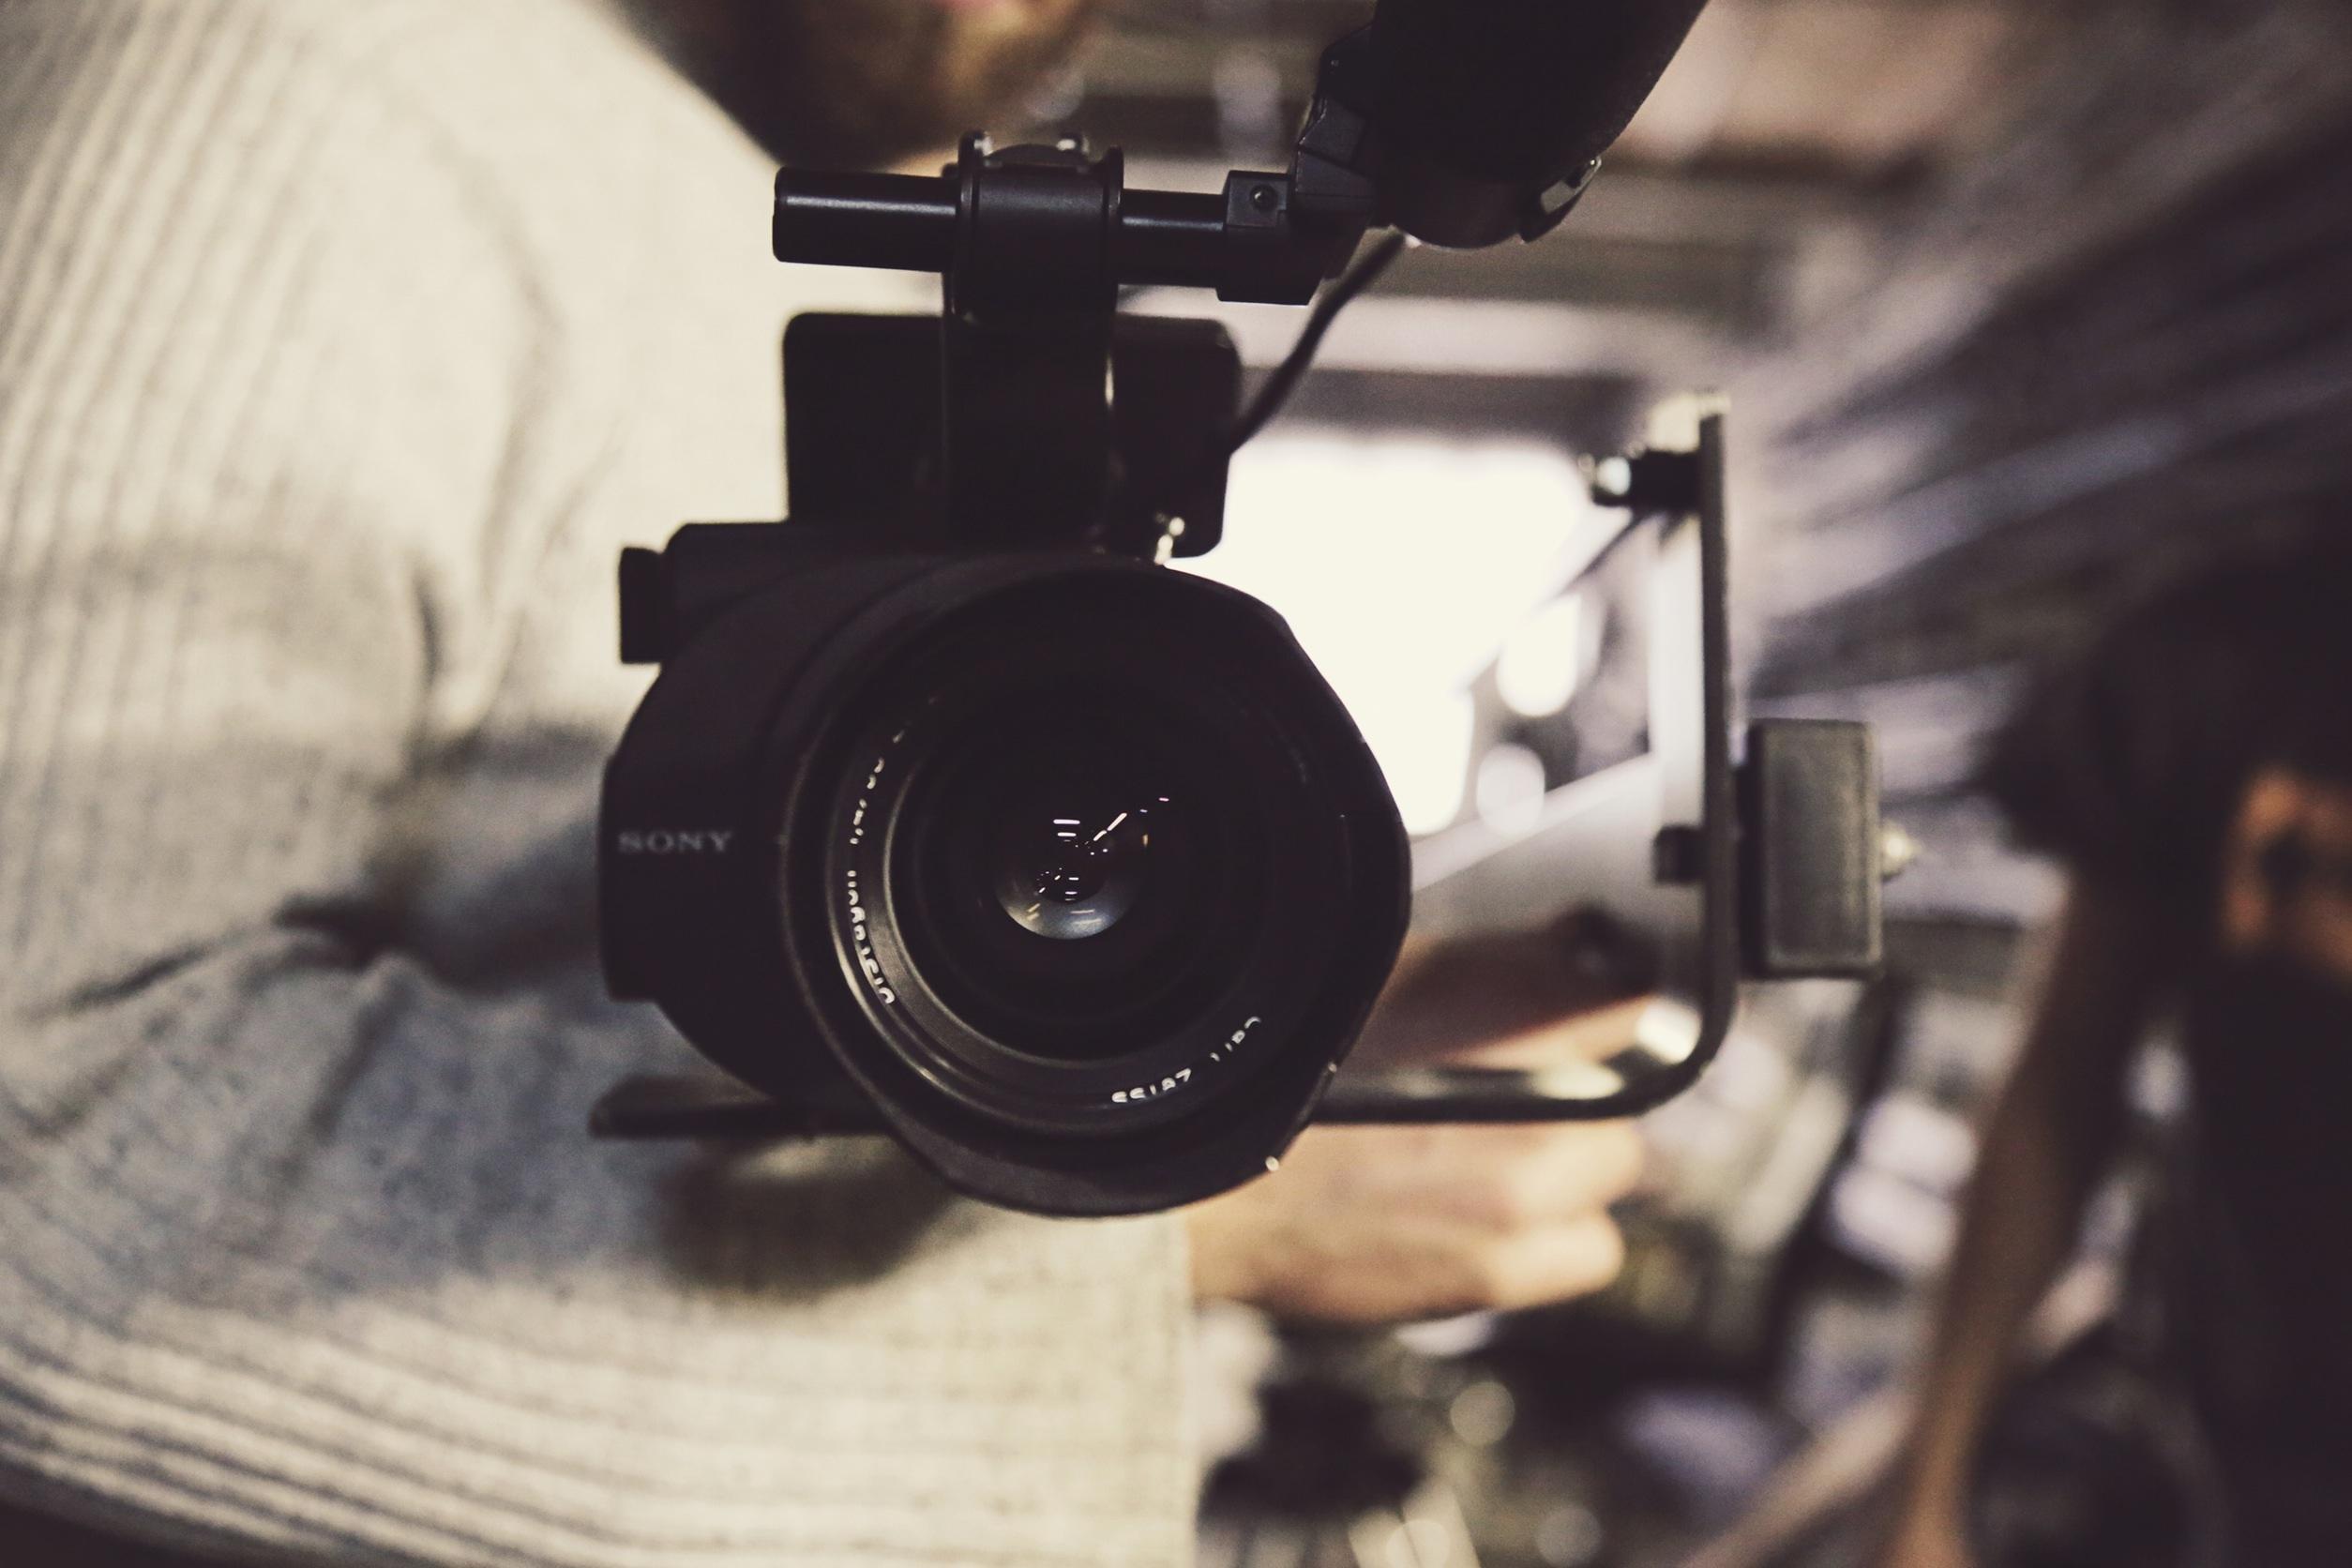 Free Images Creative Photography Photographer Film Equipment Studio Professional Black Shutter Reflex Camera Video Digital Photograph